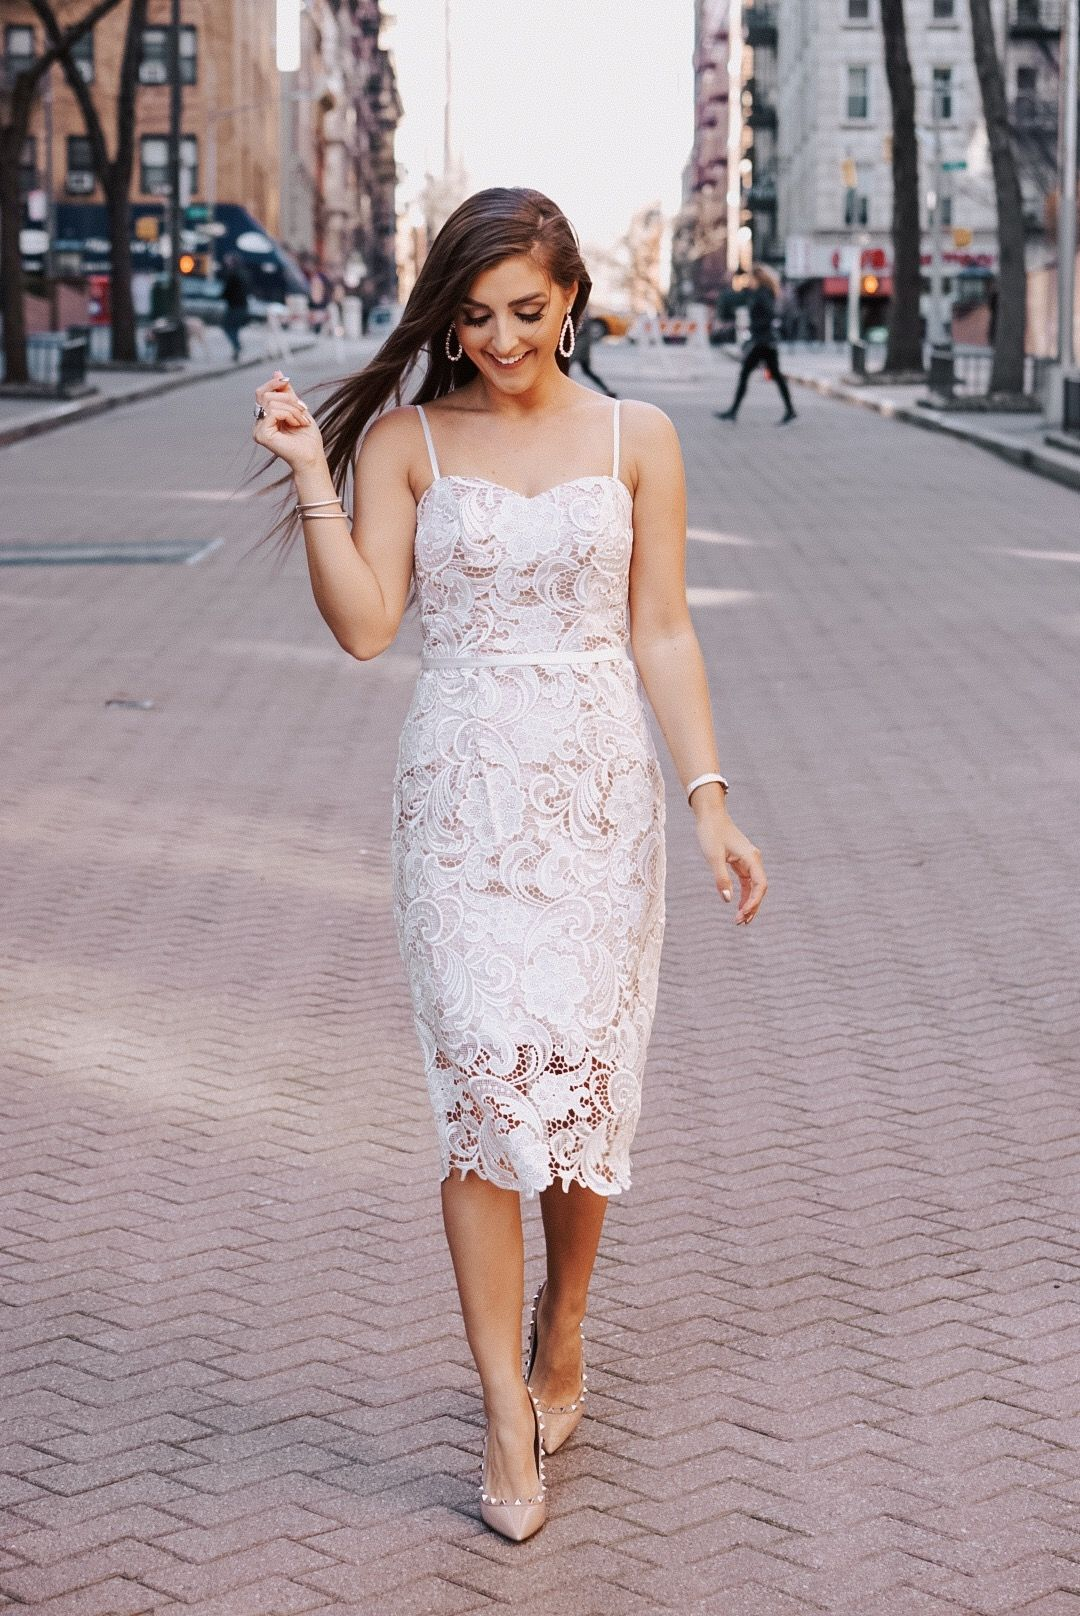 David S Bridal Little White Dress Davidsbridal Beyondthegown Ad White Wedding Guest Dresses Fall Wedding Gowns Courthouse Wedding Dress